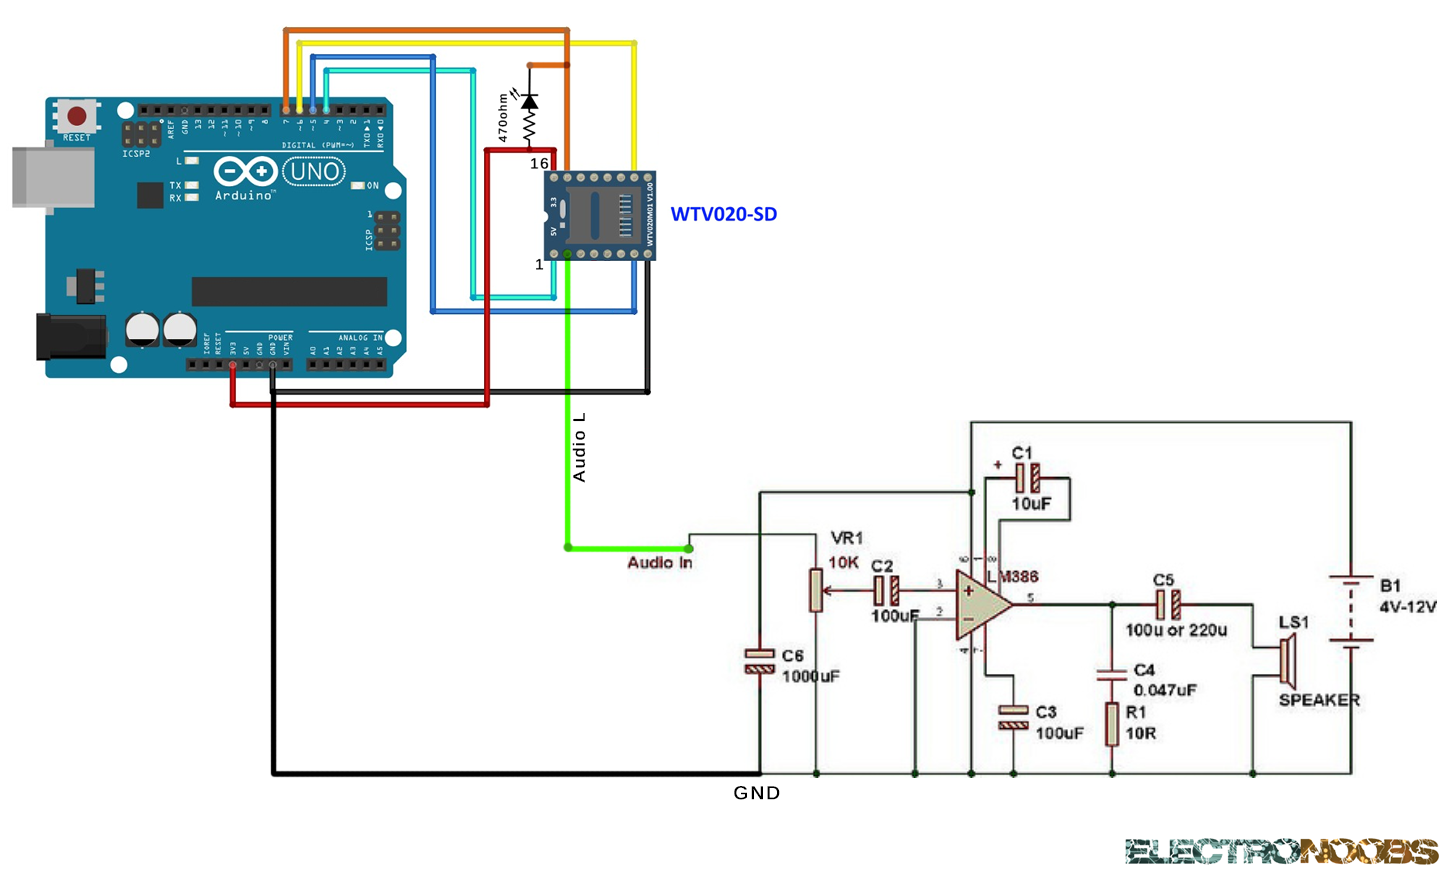 Sound amplifier for WTV020-SD sound MODULE on arduino mosfet, arduino computer, in-wall audio amplifier, arduino microcontroller, ipad audio amplifier, raspberry pi audio amplifier, arduino microphone, design audio amplifier, arduino oscilloscope, arduino bluetooth, tv audio amplifier, diy audio amplifier, sony amplifier, hi fi amplifier, audio power amplifier, mini stereo amplifier, arduino uno data sheet, surround sound amplifier, wifi audio amplifier,